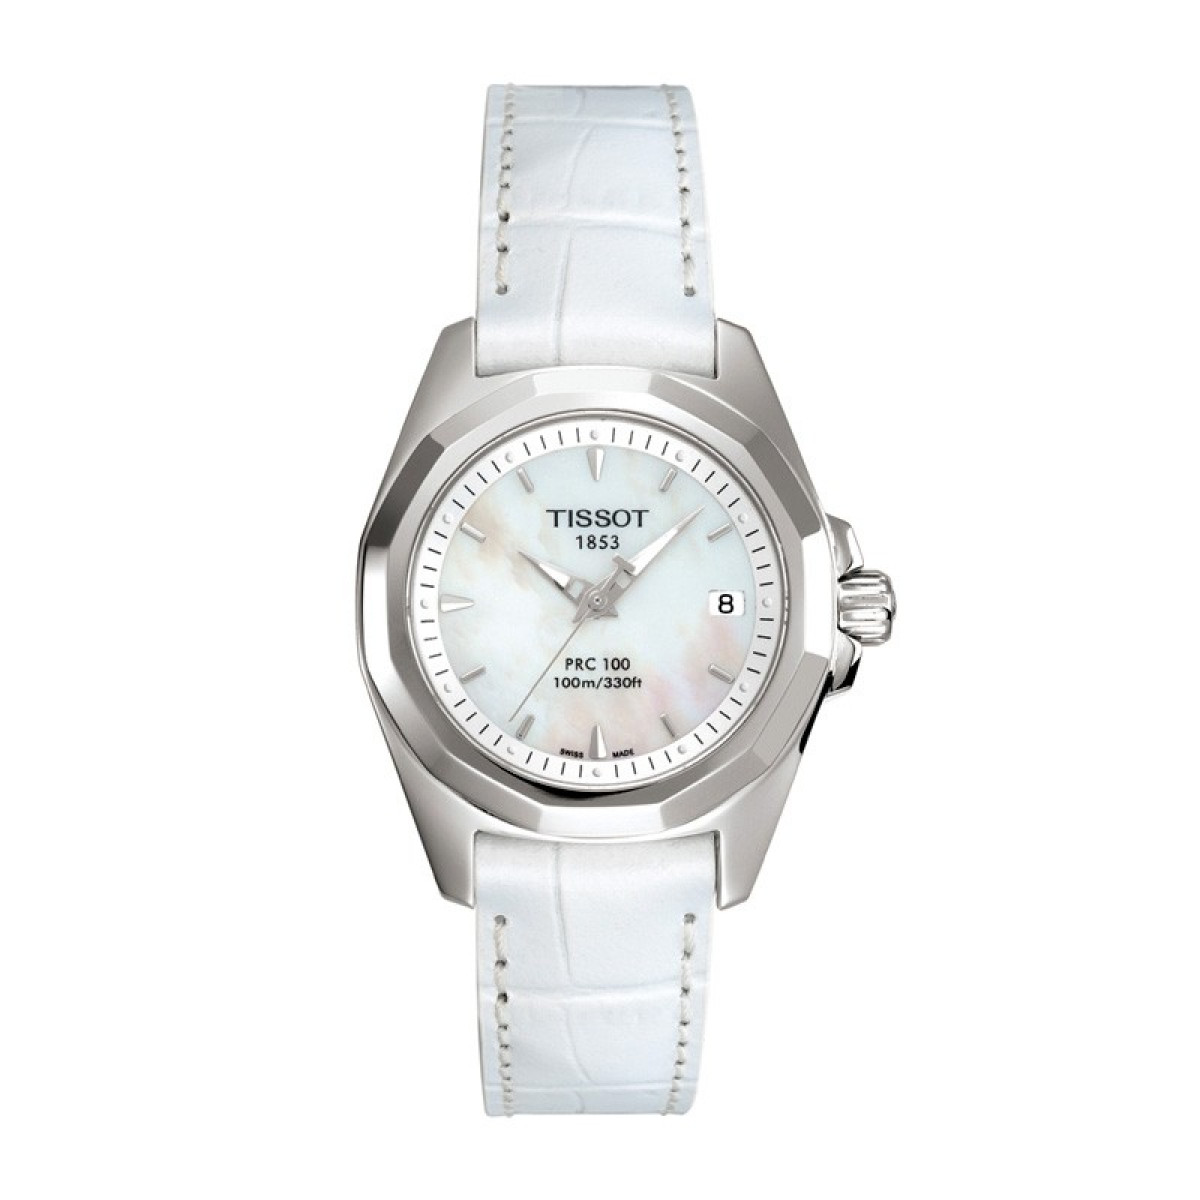 Часовник Tissot T008.010.16.111.00